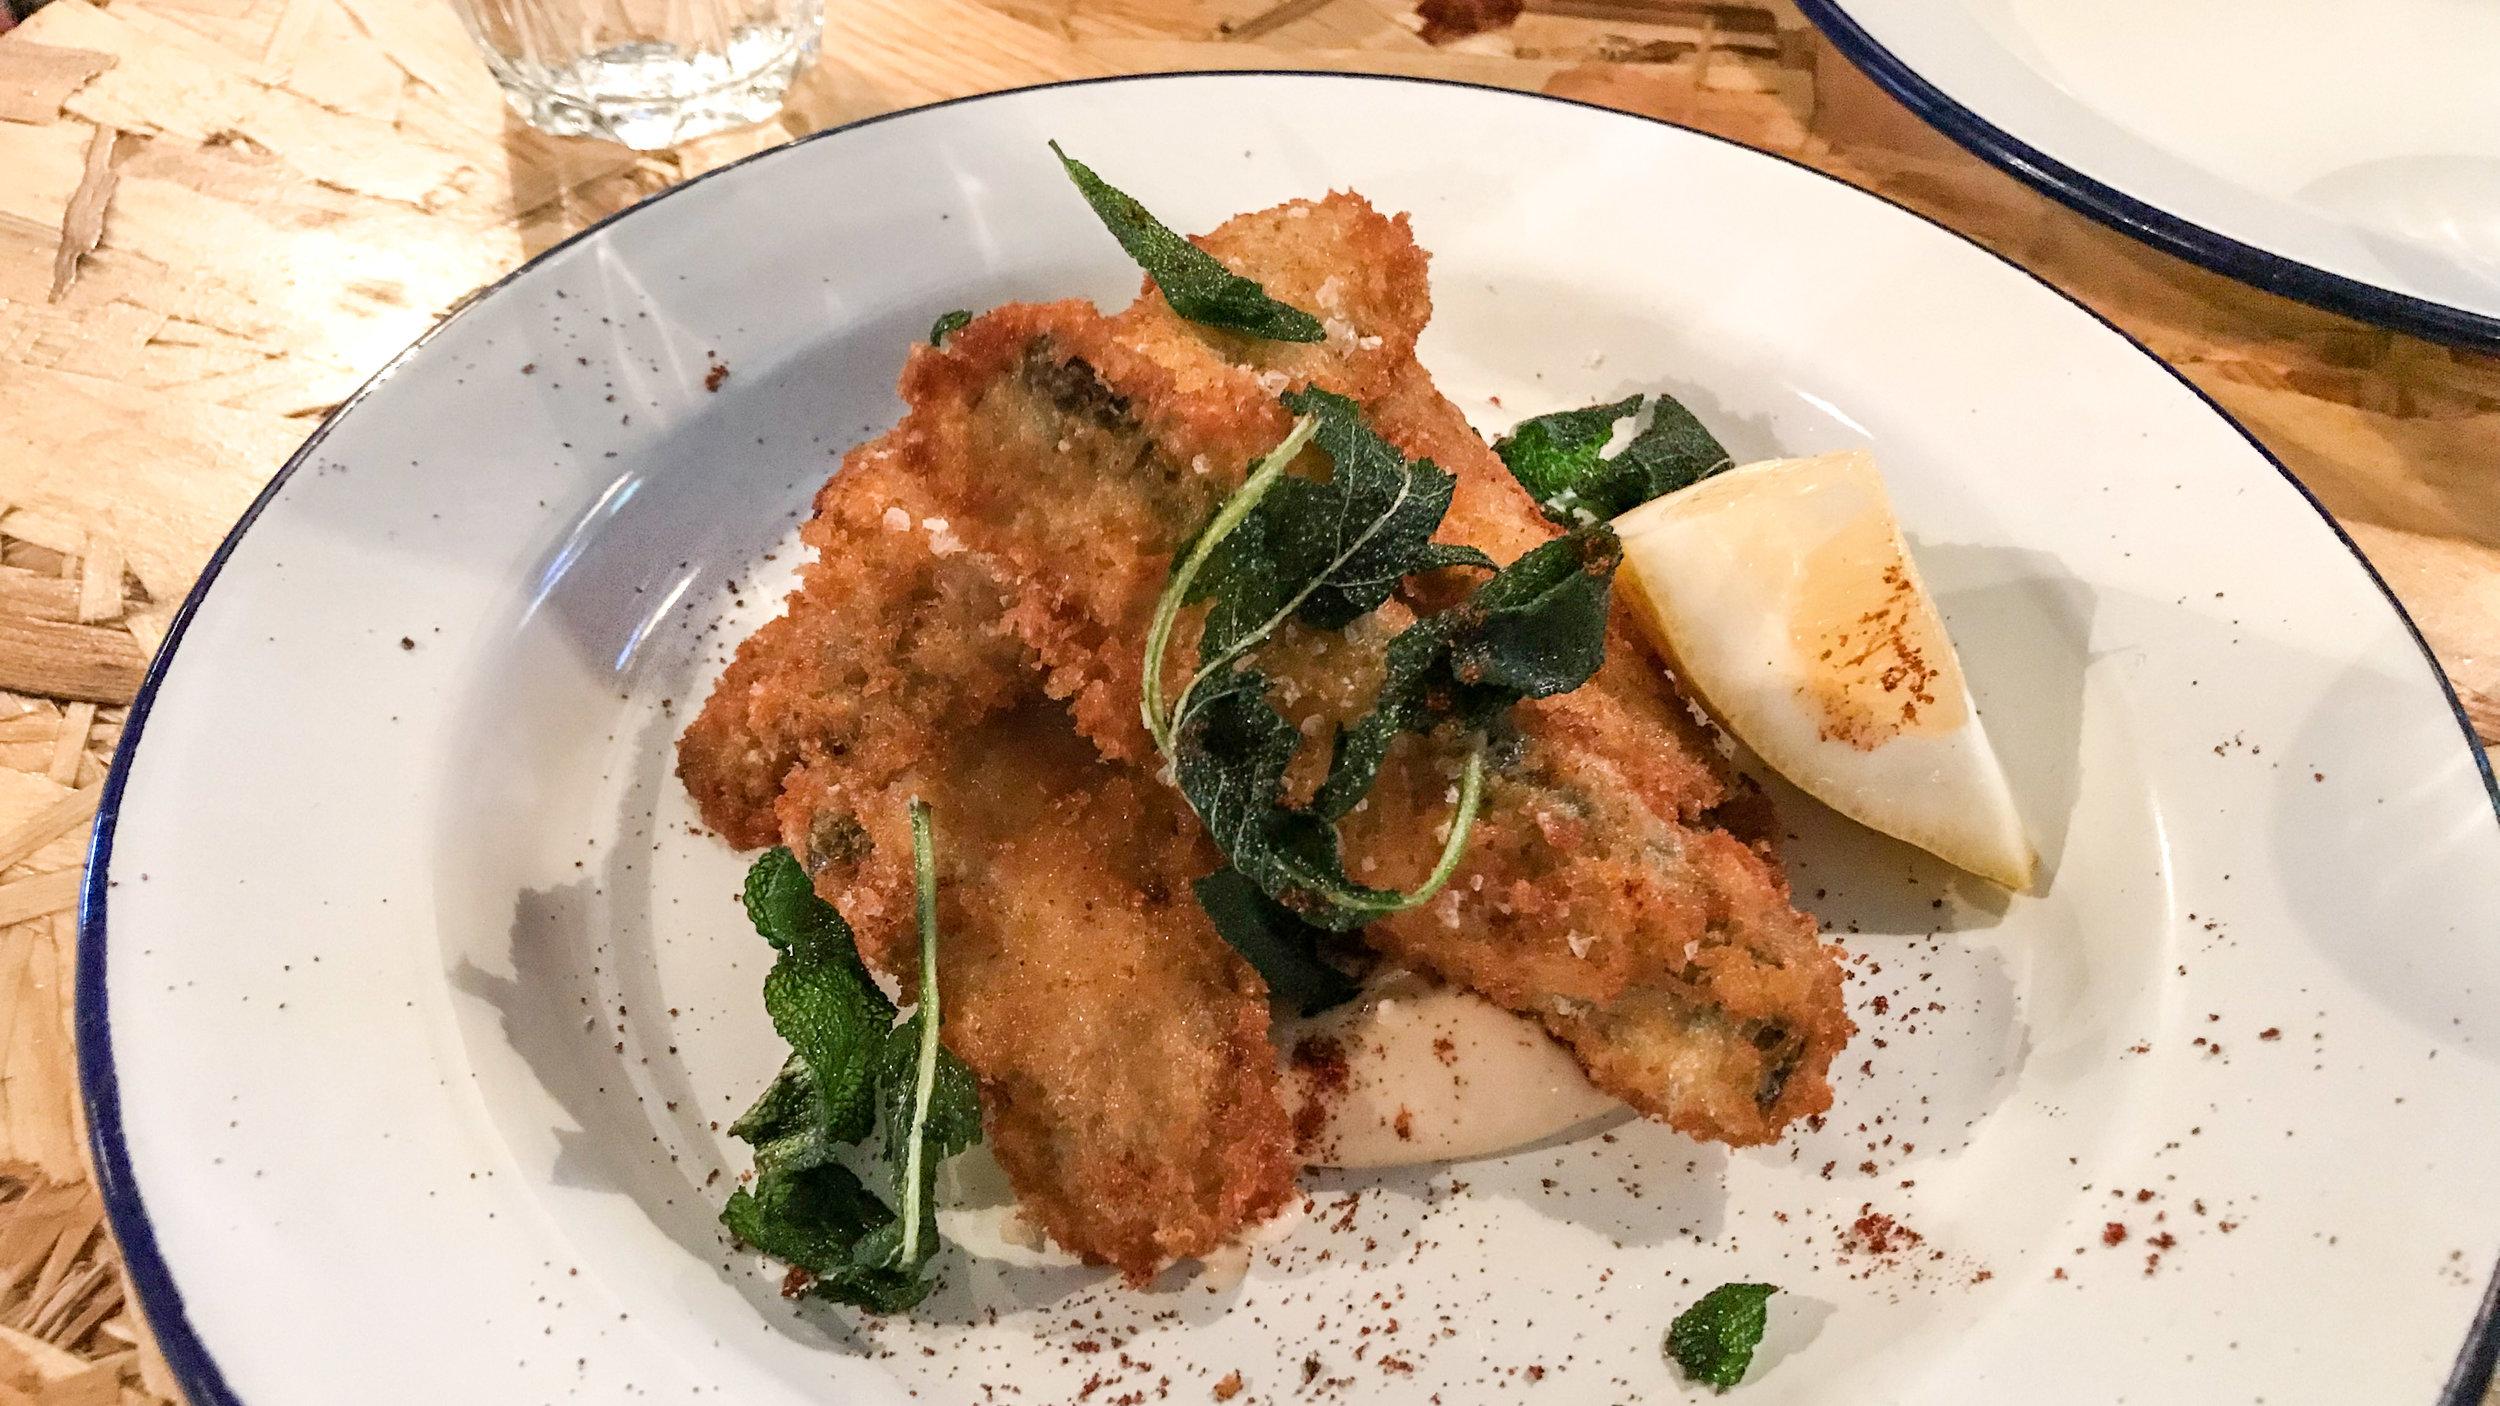 mr_liquor_merivale_mascot_popup_sydney_dirty_italian_disco_restaurant_diner_fried_sardines